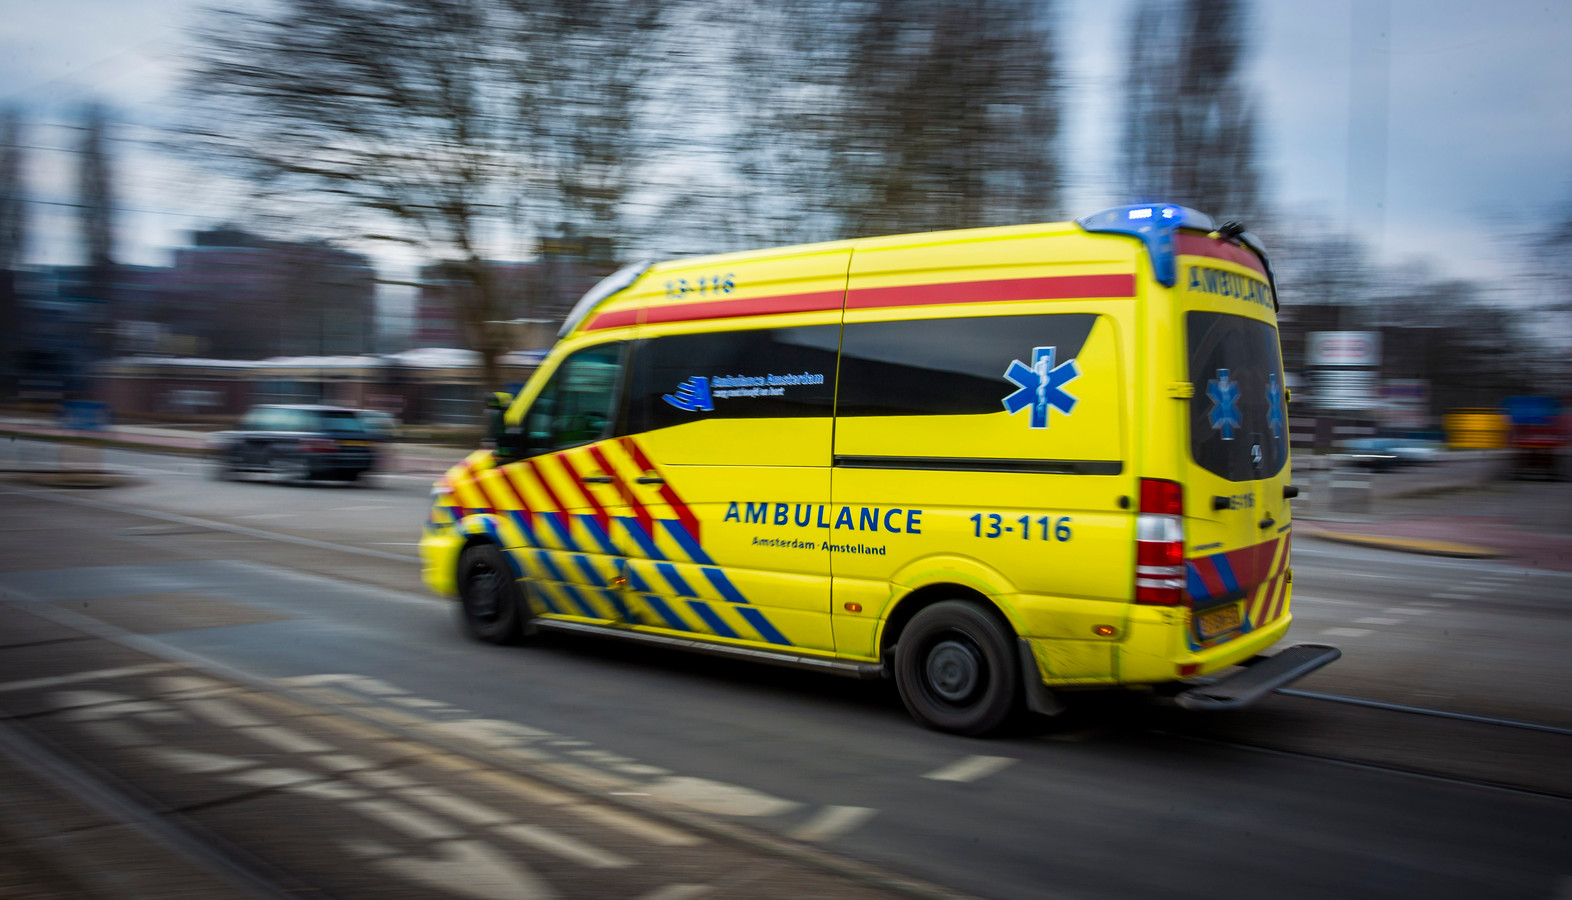 Ambulancevervoer